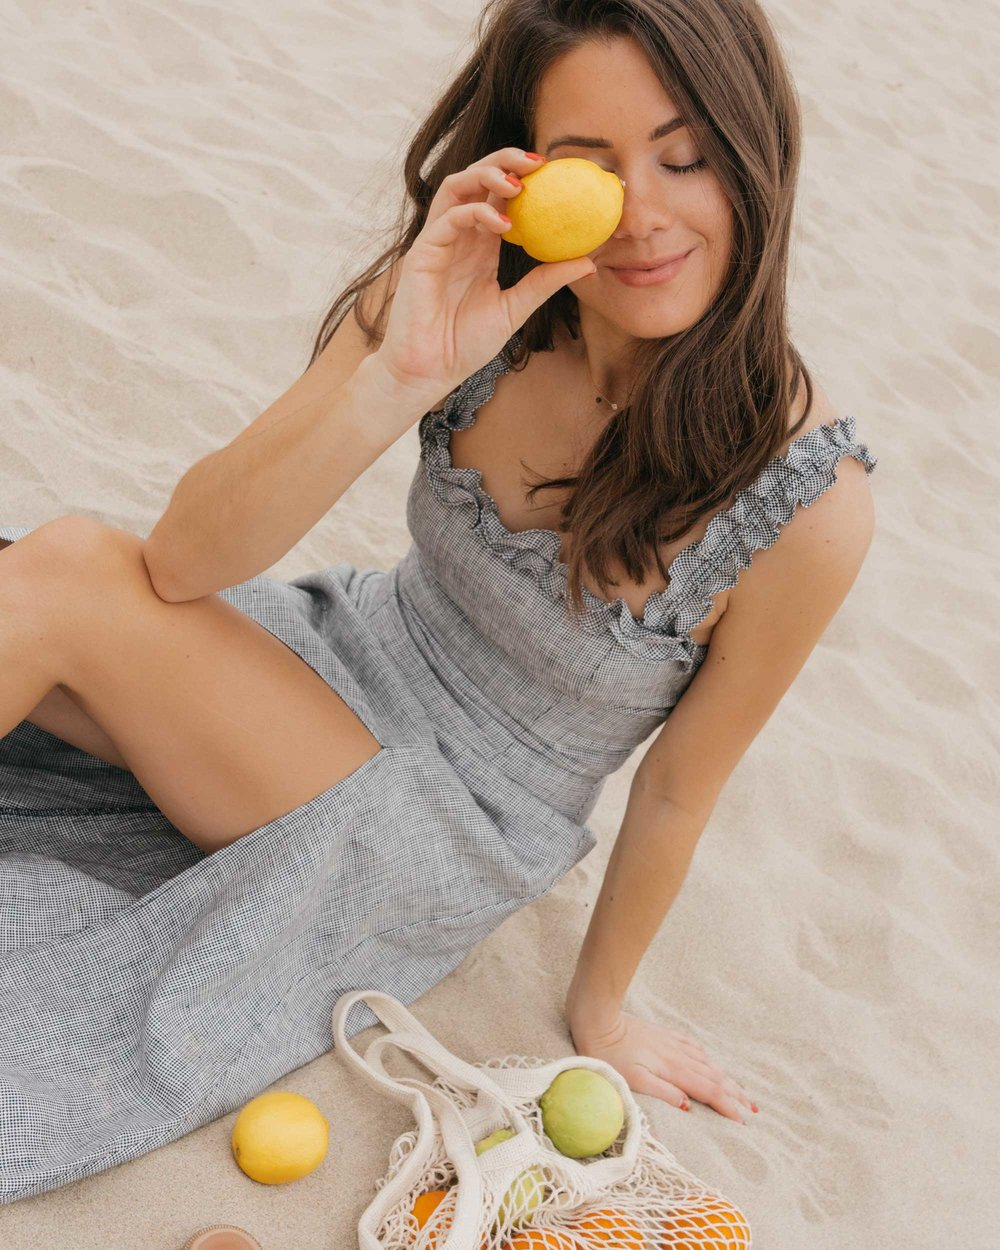 Reformation Lavendar Midi Dress Cotton Net Shopping Tote Newport Beach California Summer Outfit9.jpg